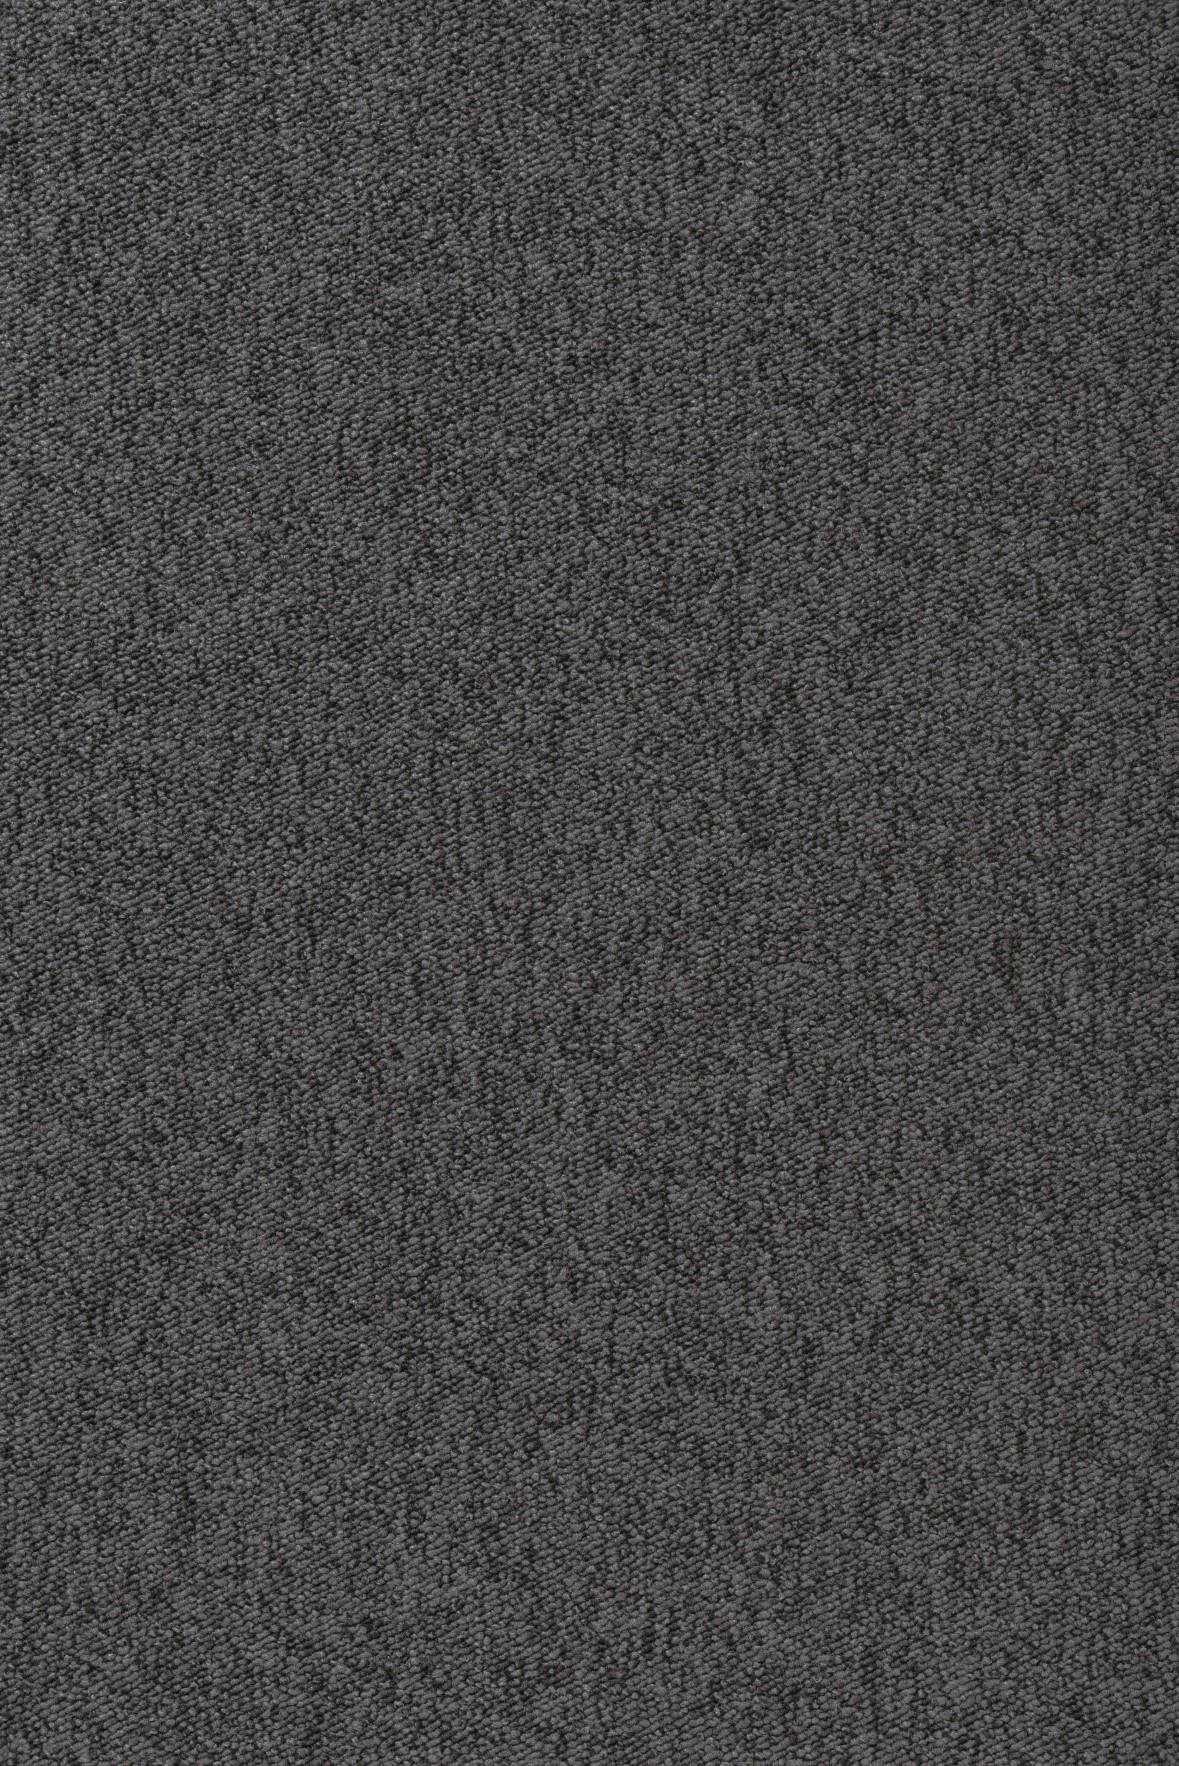 teppichboden schlinge kaufen rabatte bis zu 60. Black Bedroom Furniture Sets. Home Design Ideas